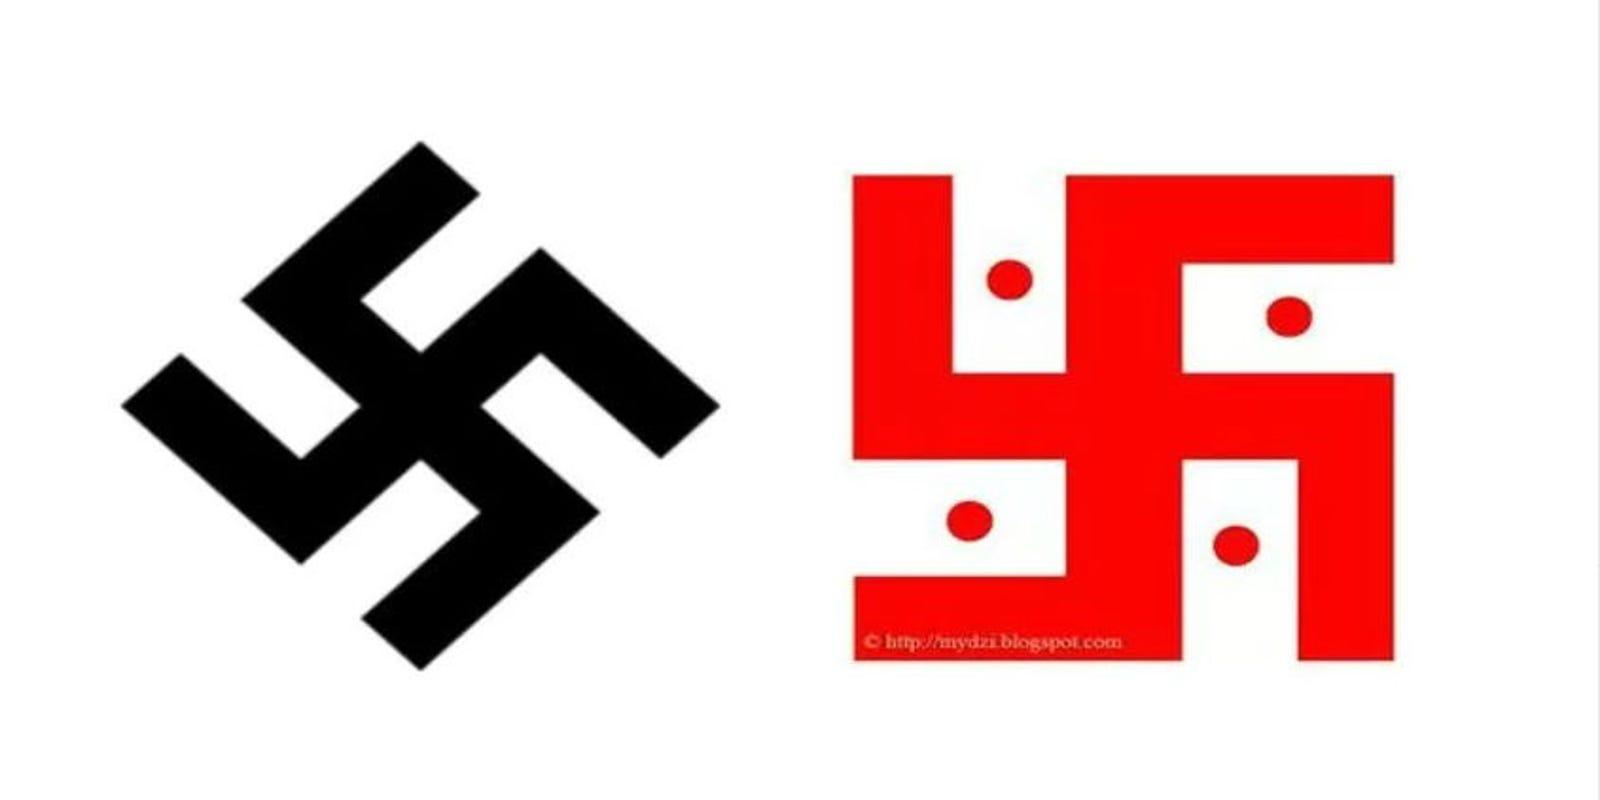 School Student Debate Use Of Hindu Swastika